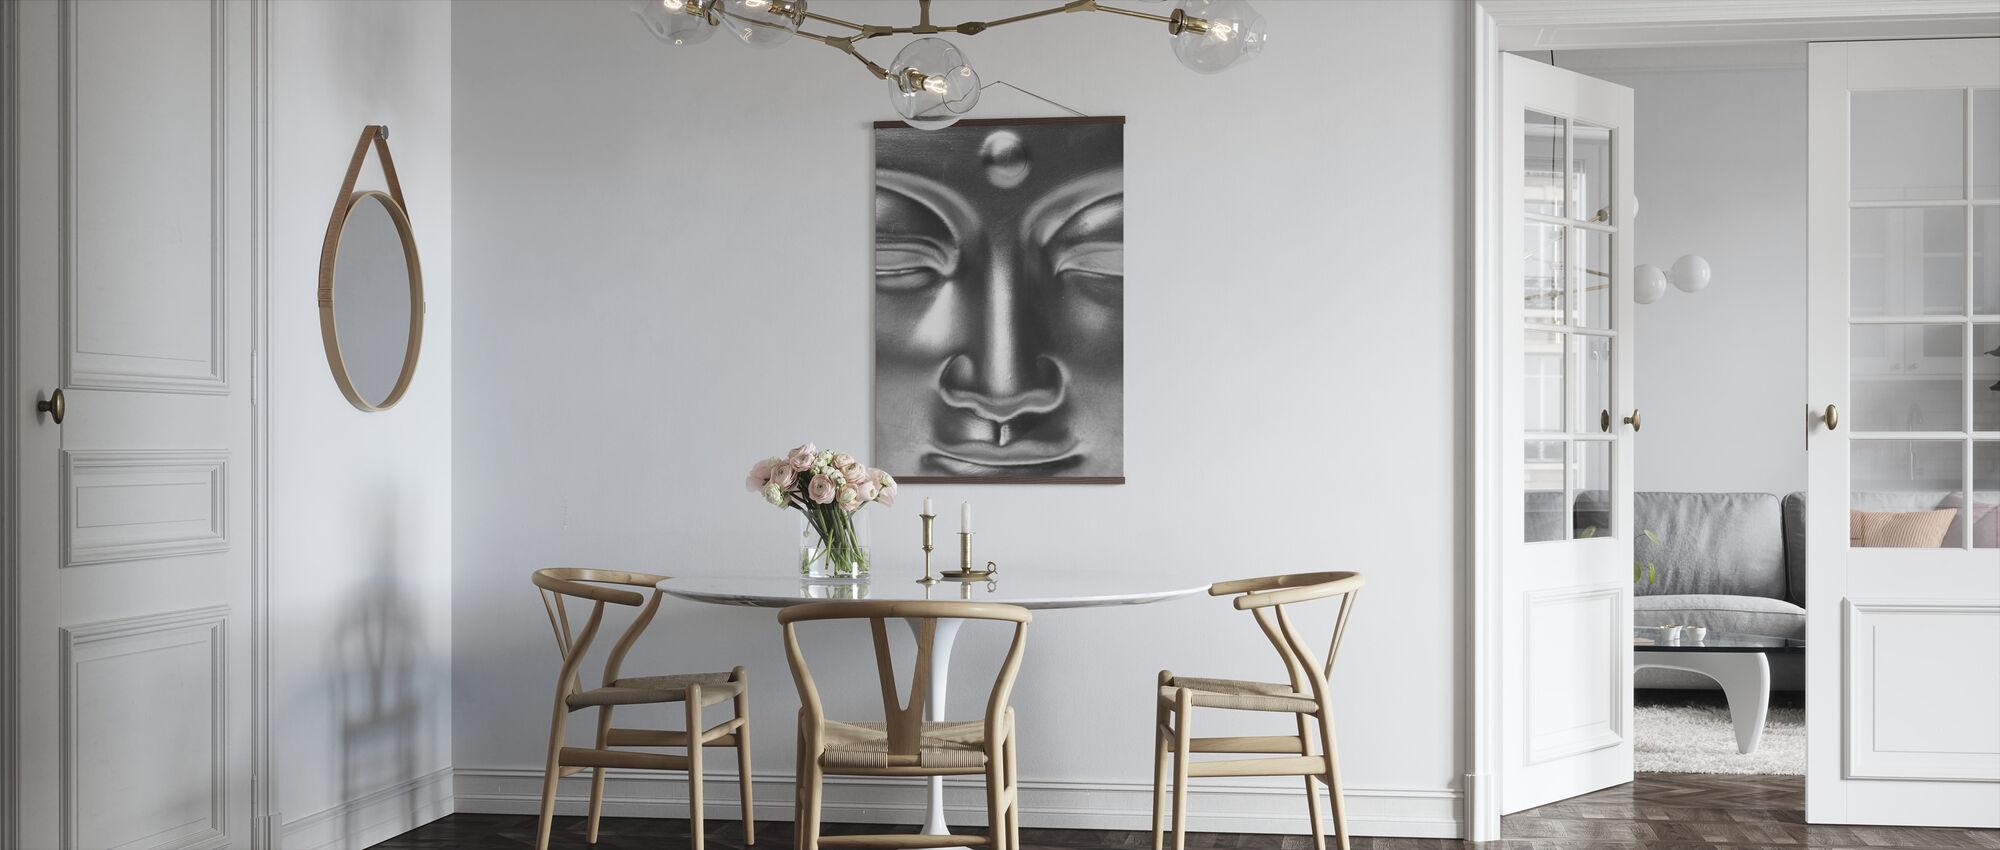 Gouden Boeddha Close Up - z/w - Poster - Keuken